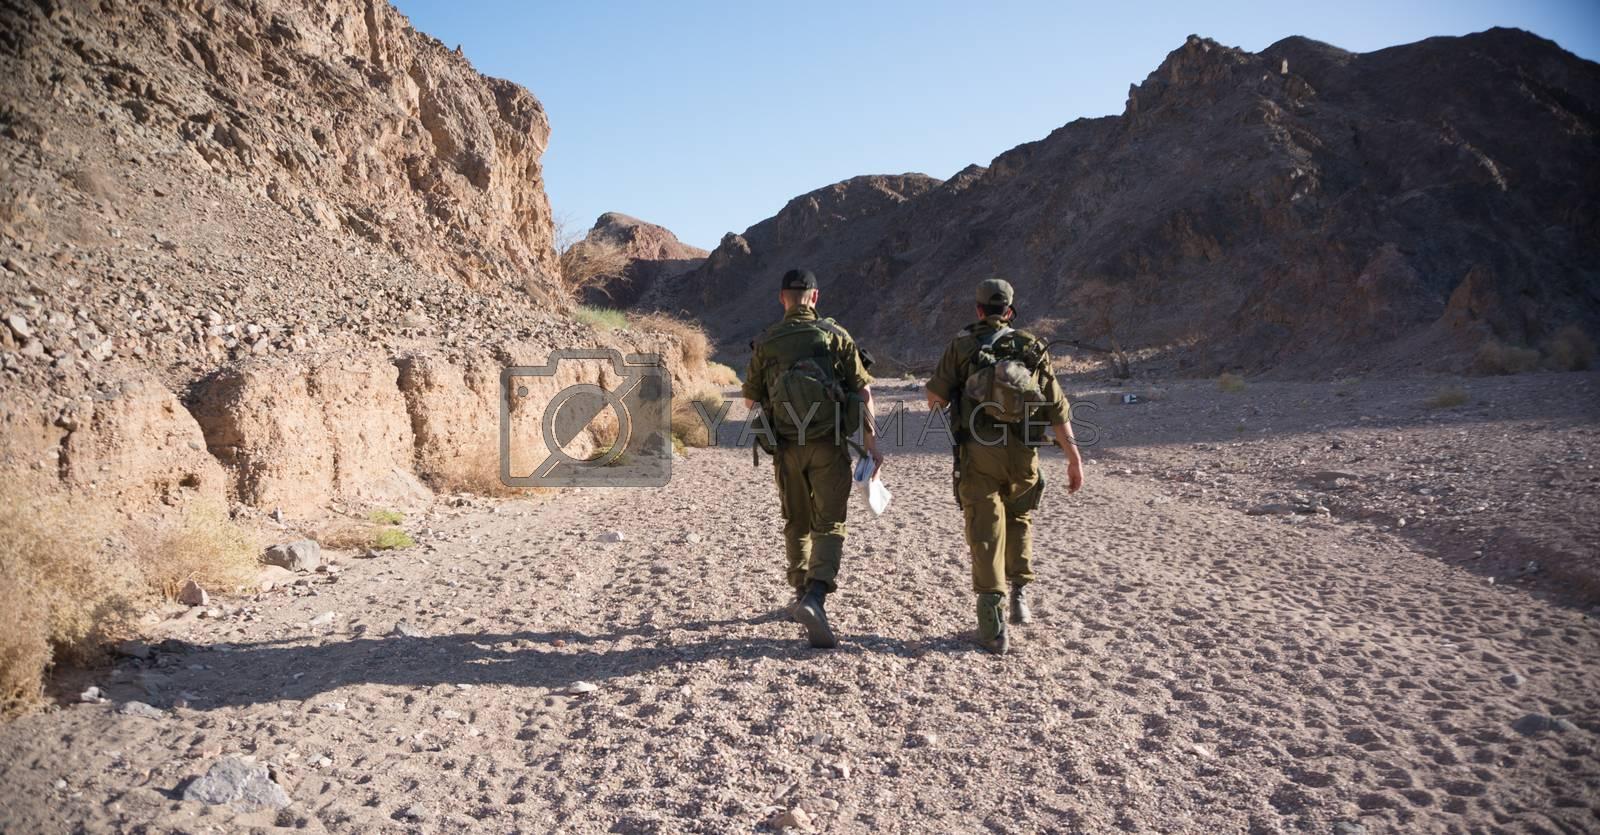 Israeli army patrol in middle east war